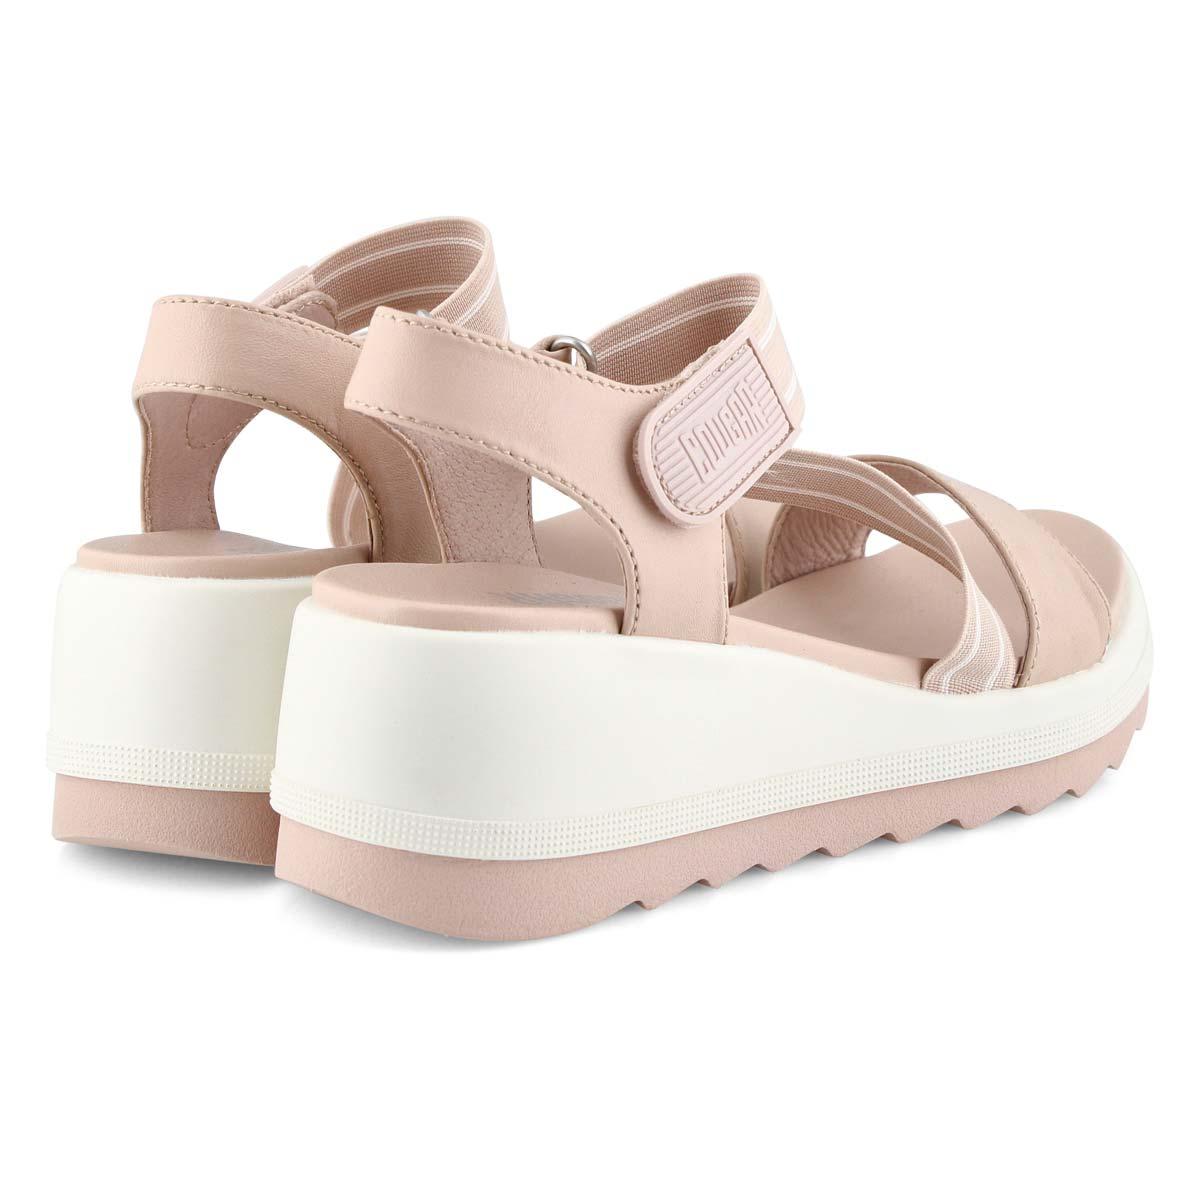 Women's HIBISCUS shell wedge sandals